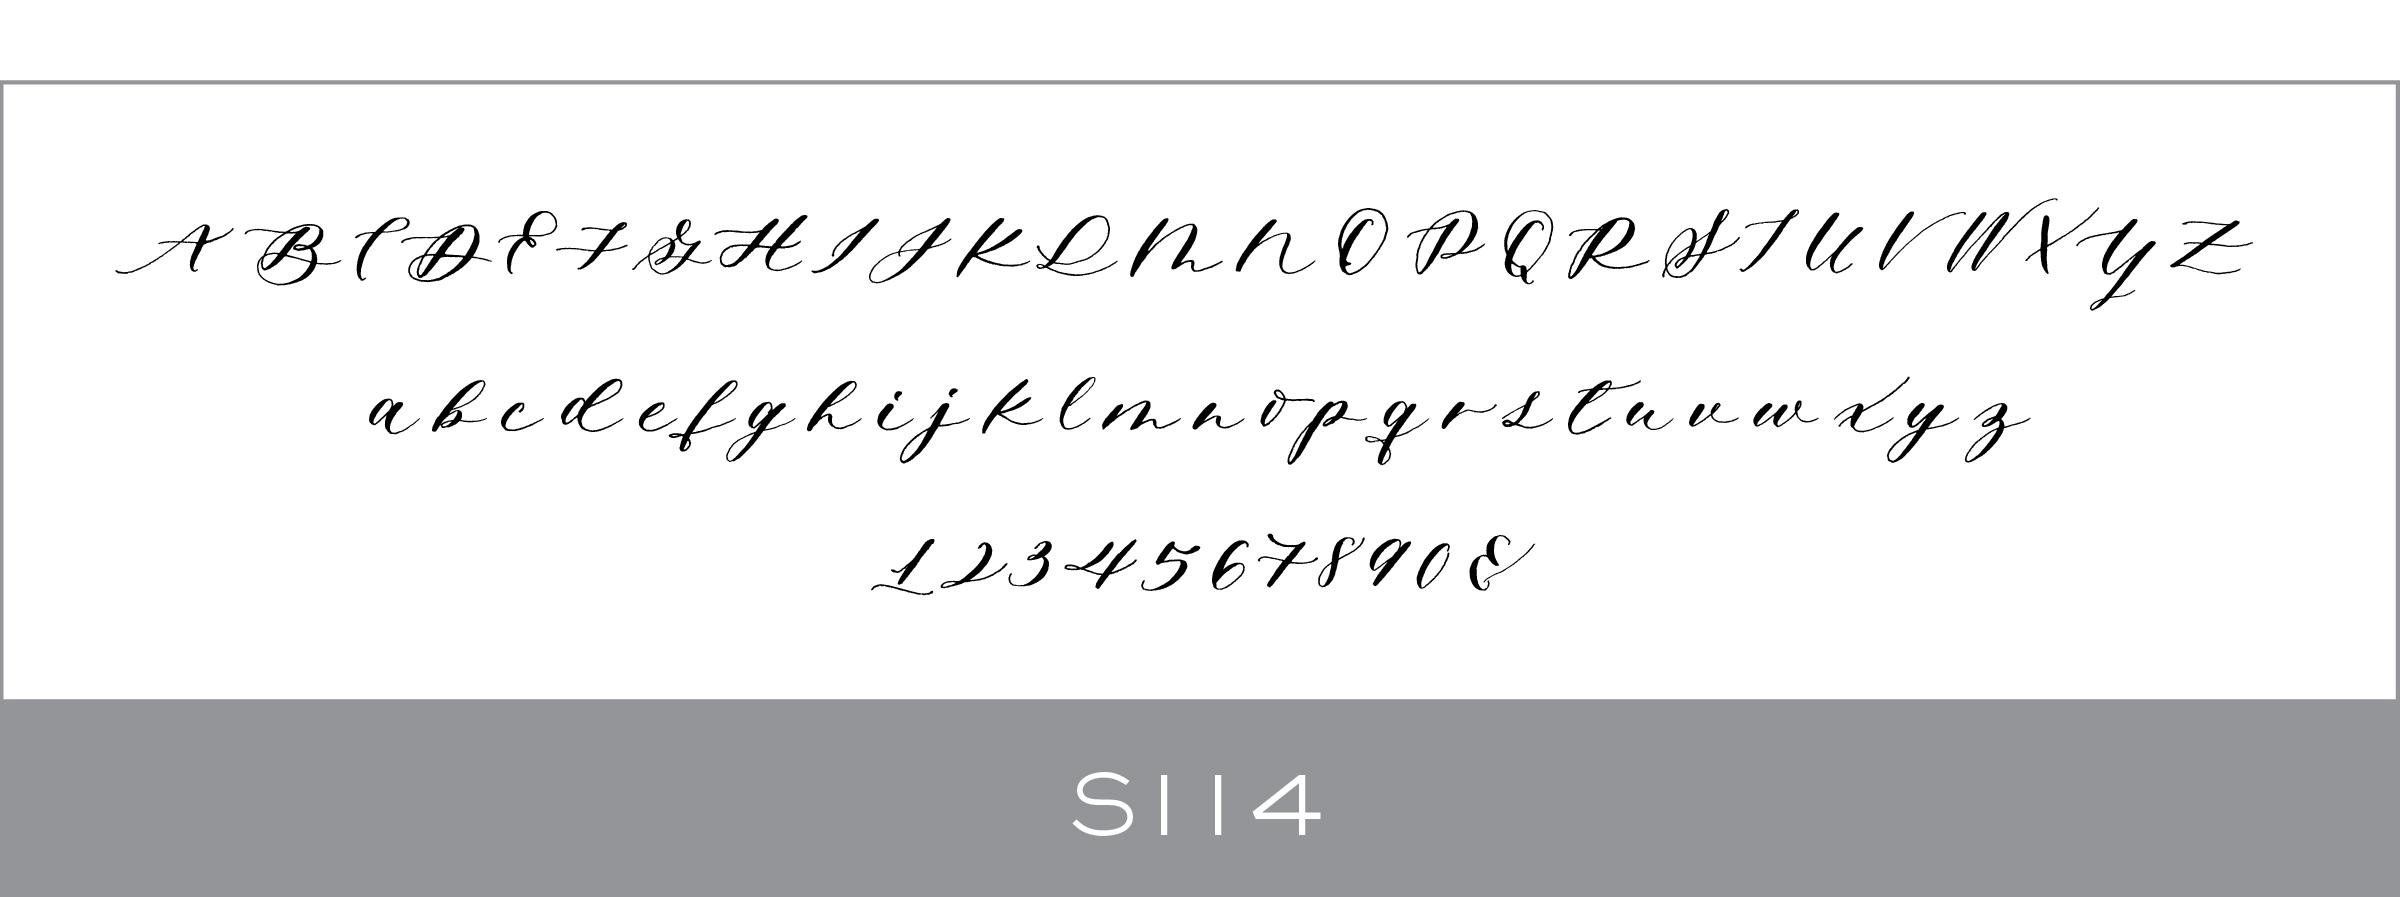 S114_Haute_Papier_Font.jpg